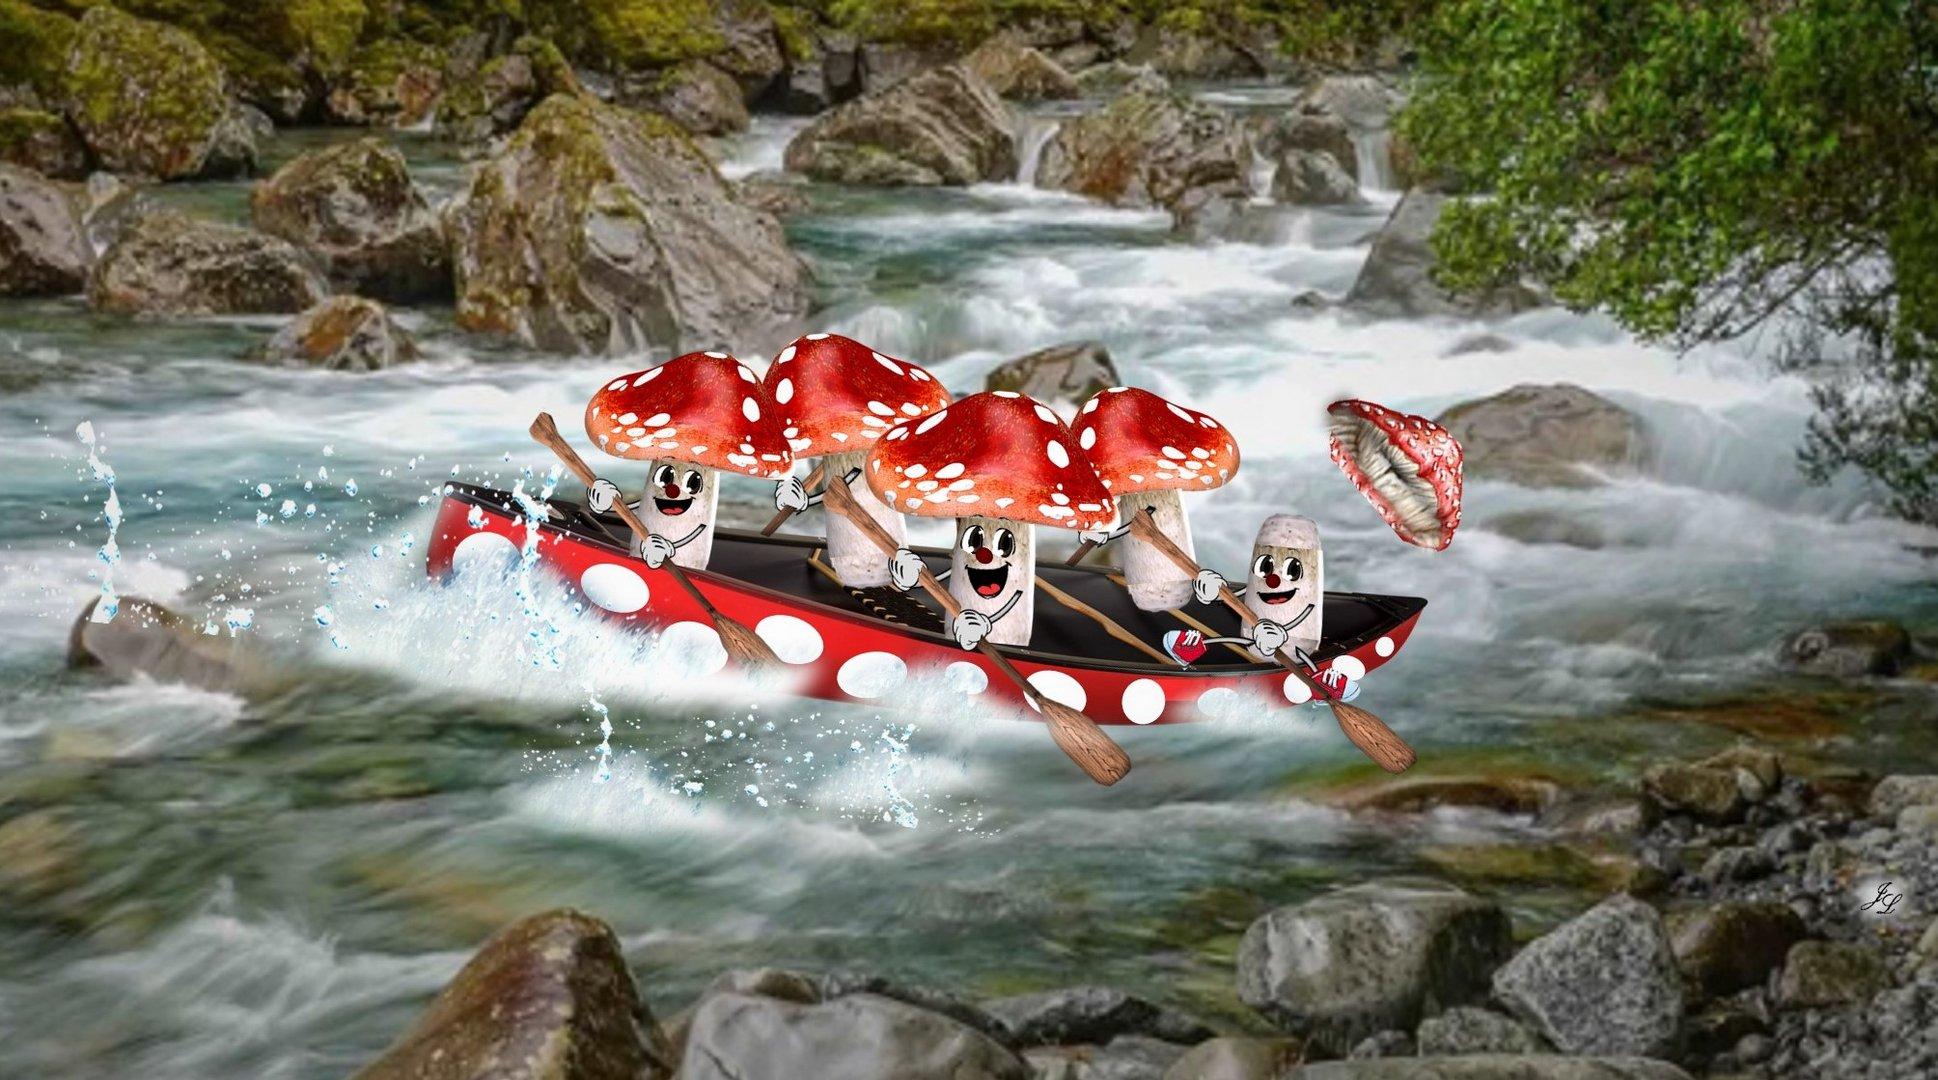 Fliegenpilz_Wildwasserfahrt